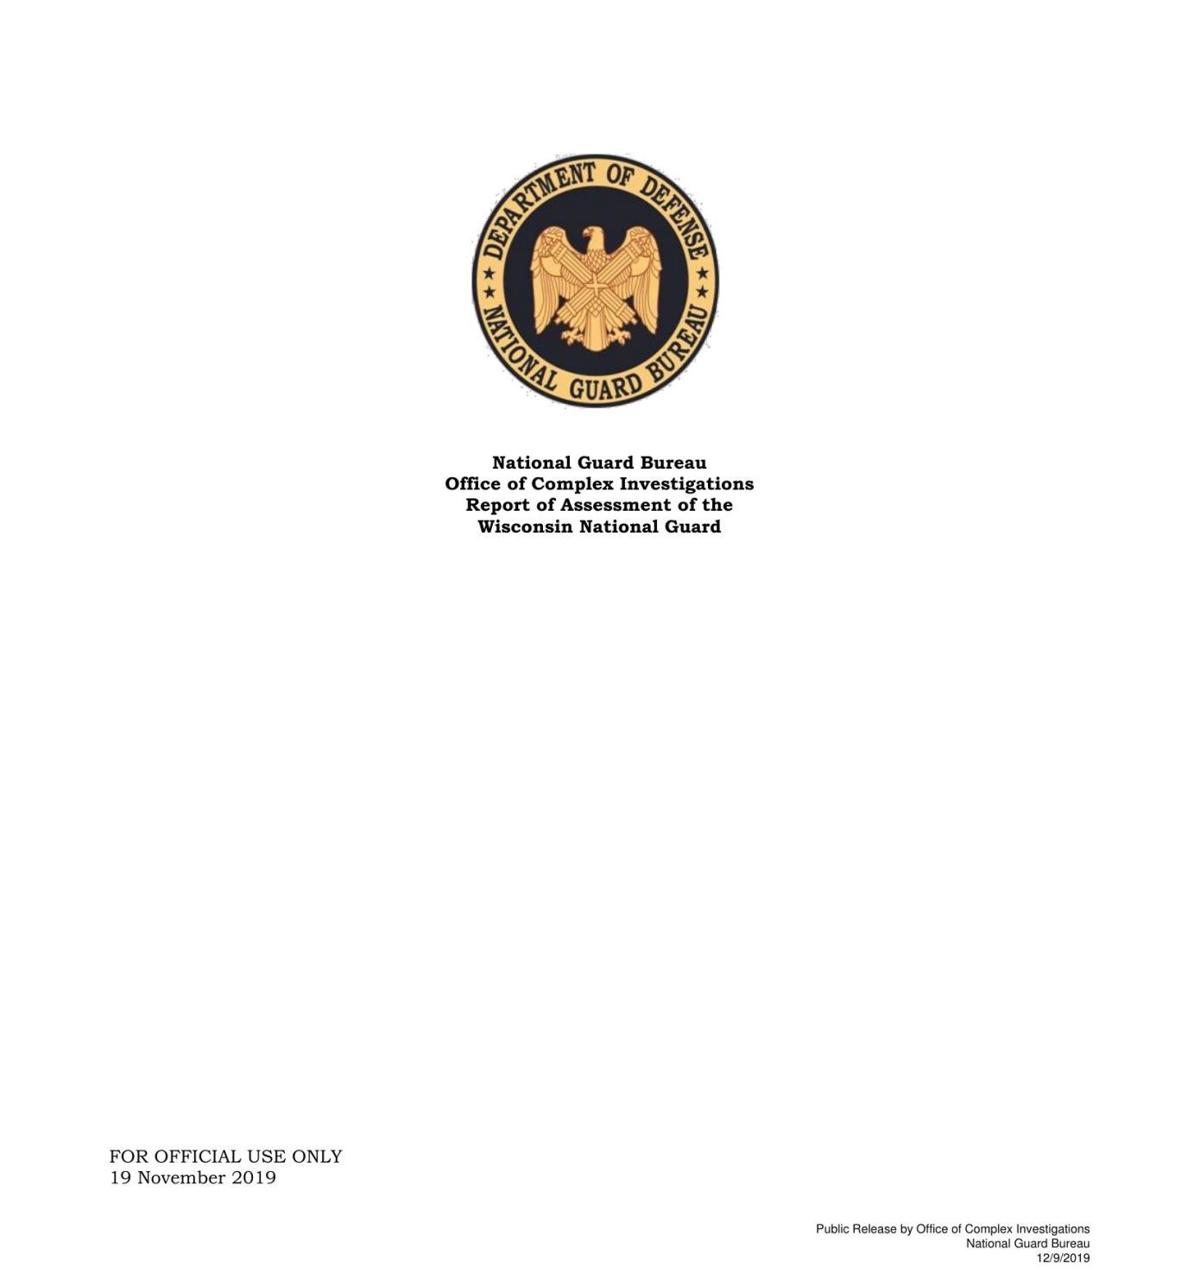 National Guard Bureau report